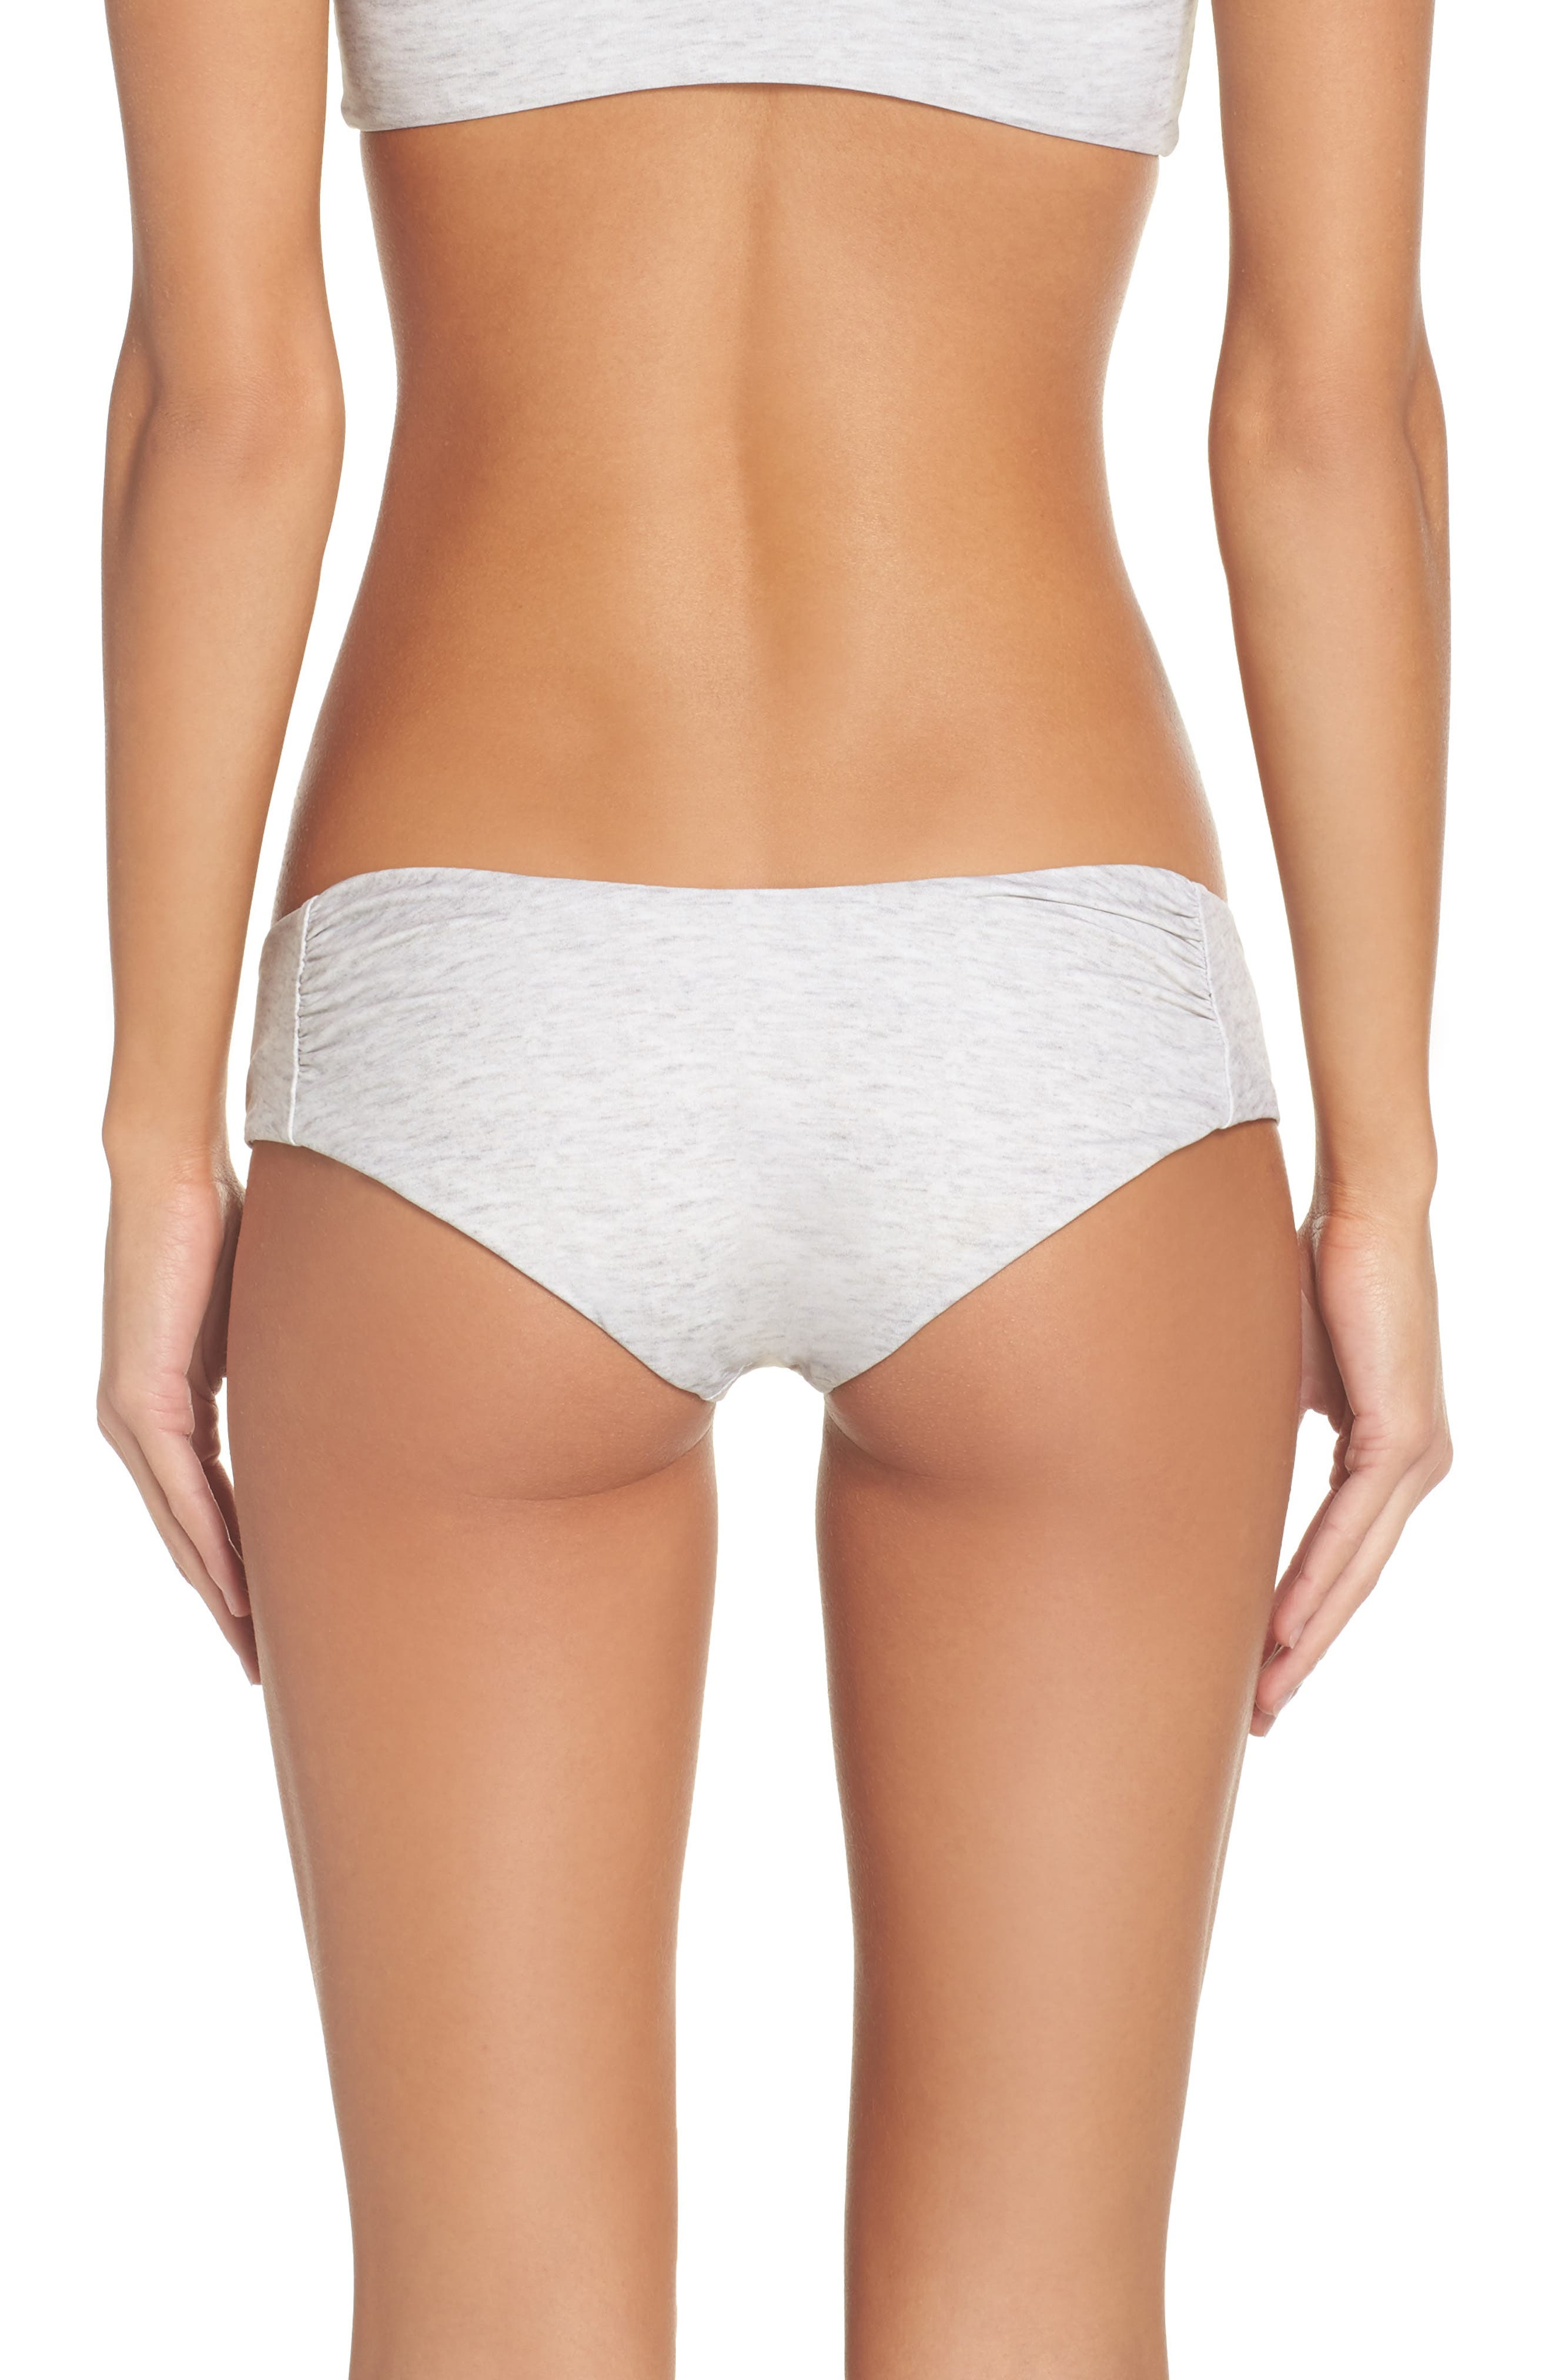 Alternate Image 1 Selected - Boys + Arrows Yaya the Yuppy Bikini Bottoms